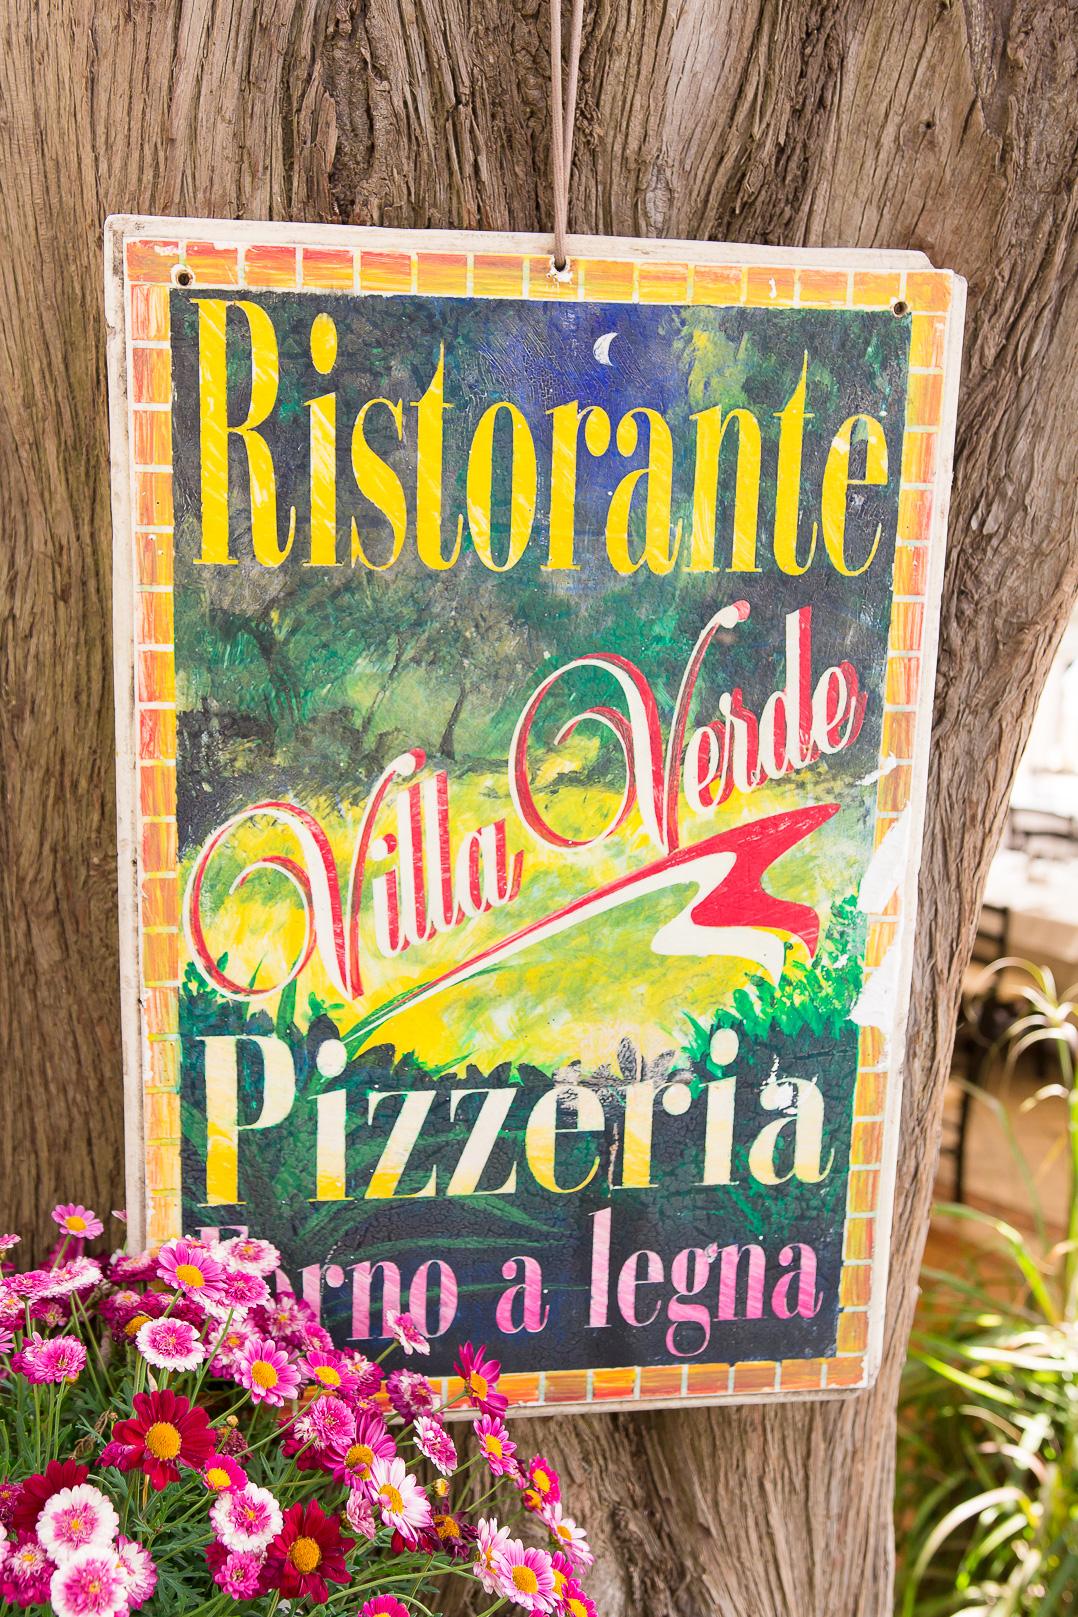 Villa Verde for lunch!